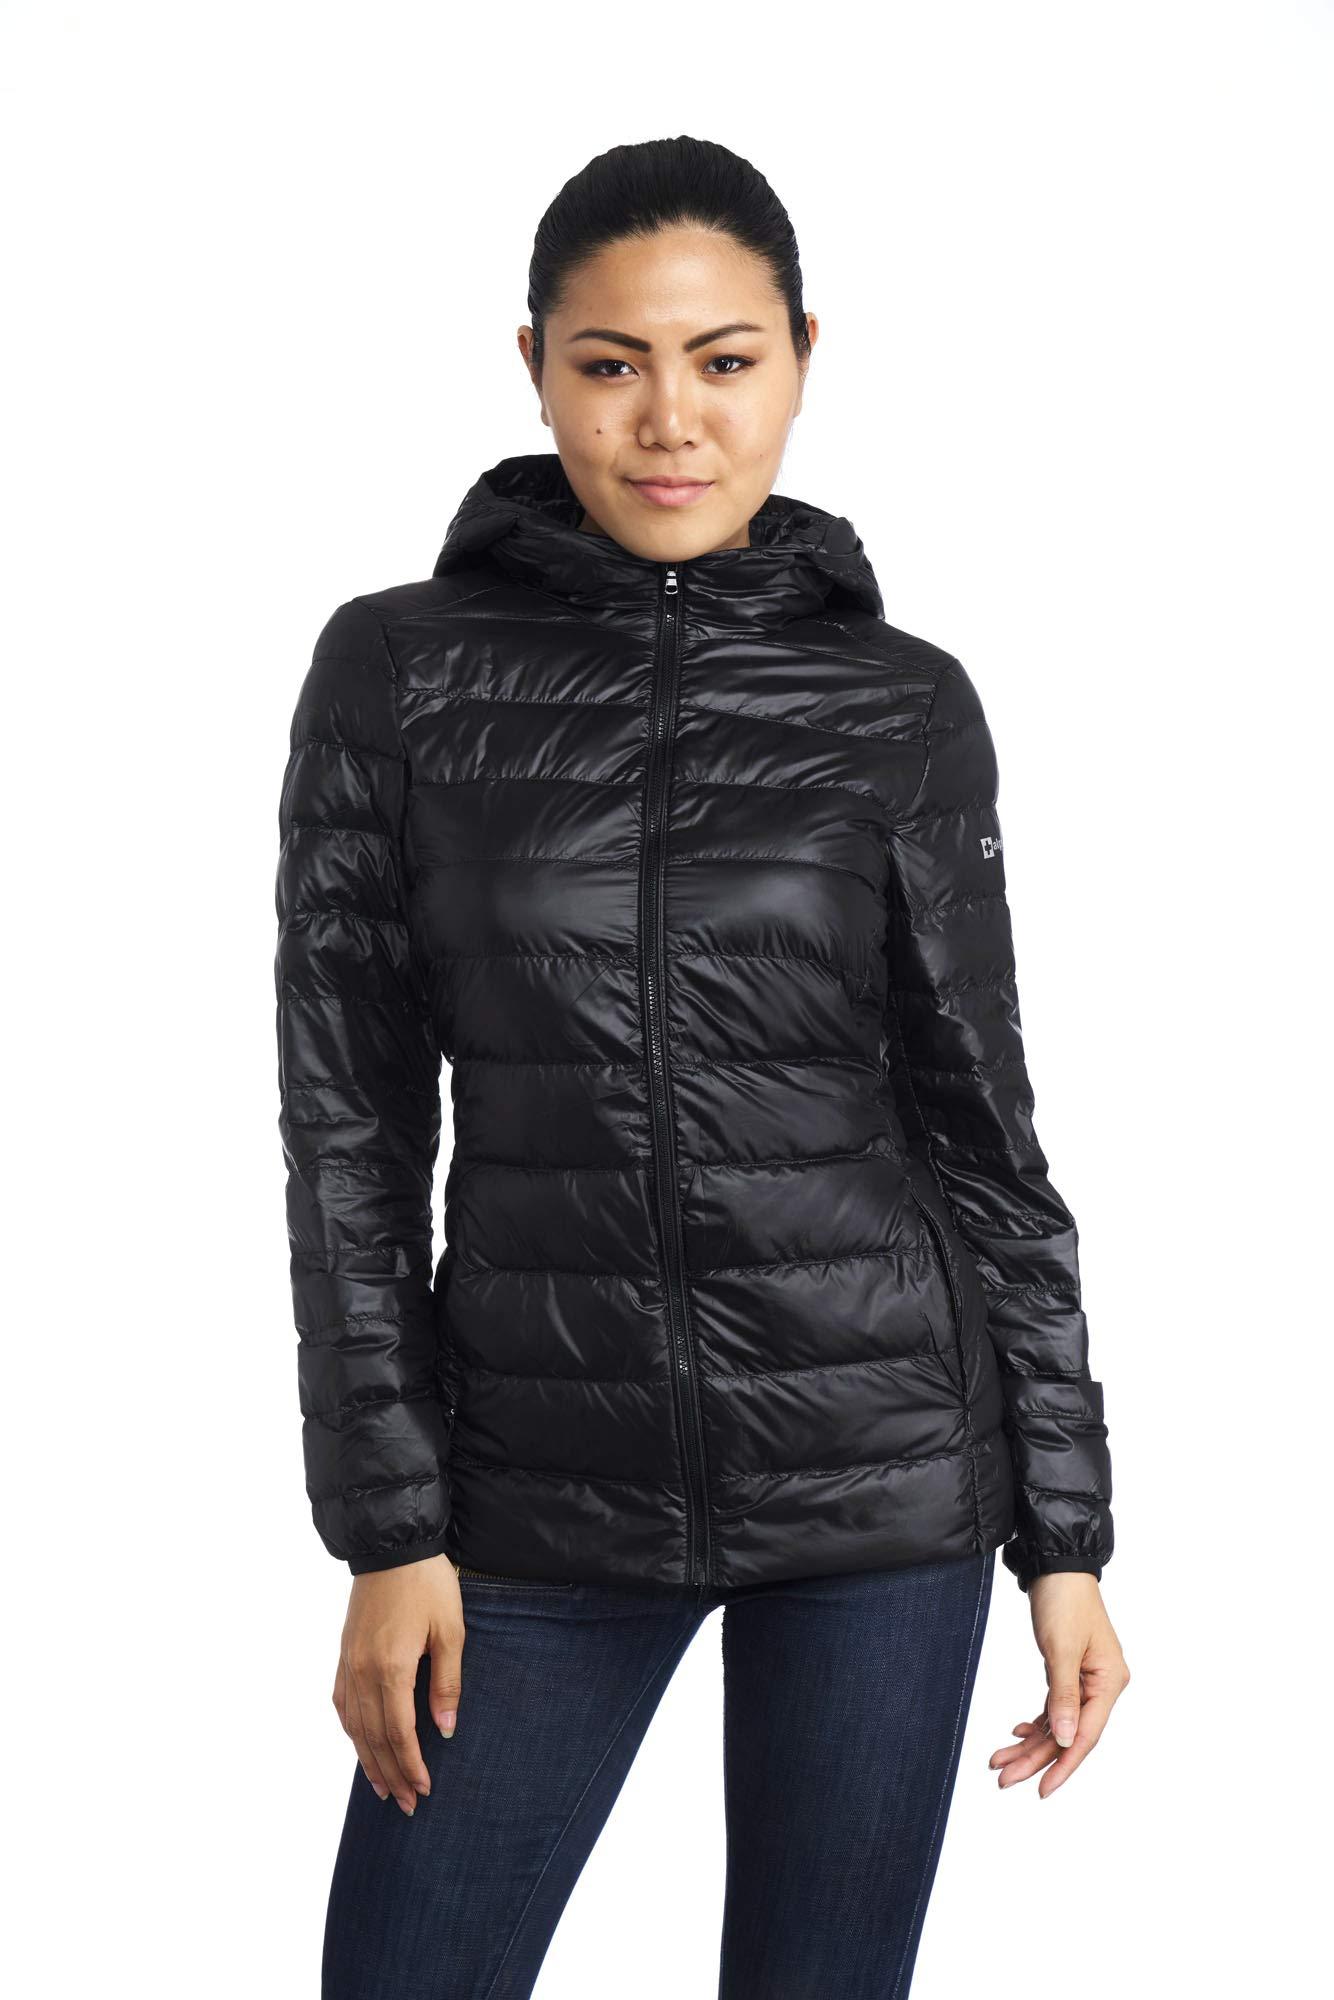 alpine swiss Eva Womens Down Jacket Hooded Puffer Coat Packable Insulation & Light BLK MED